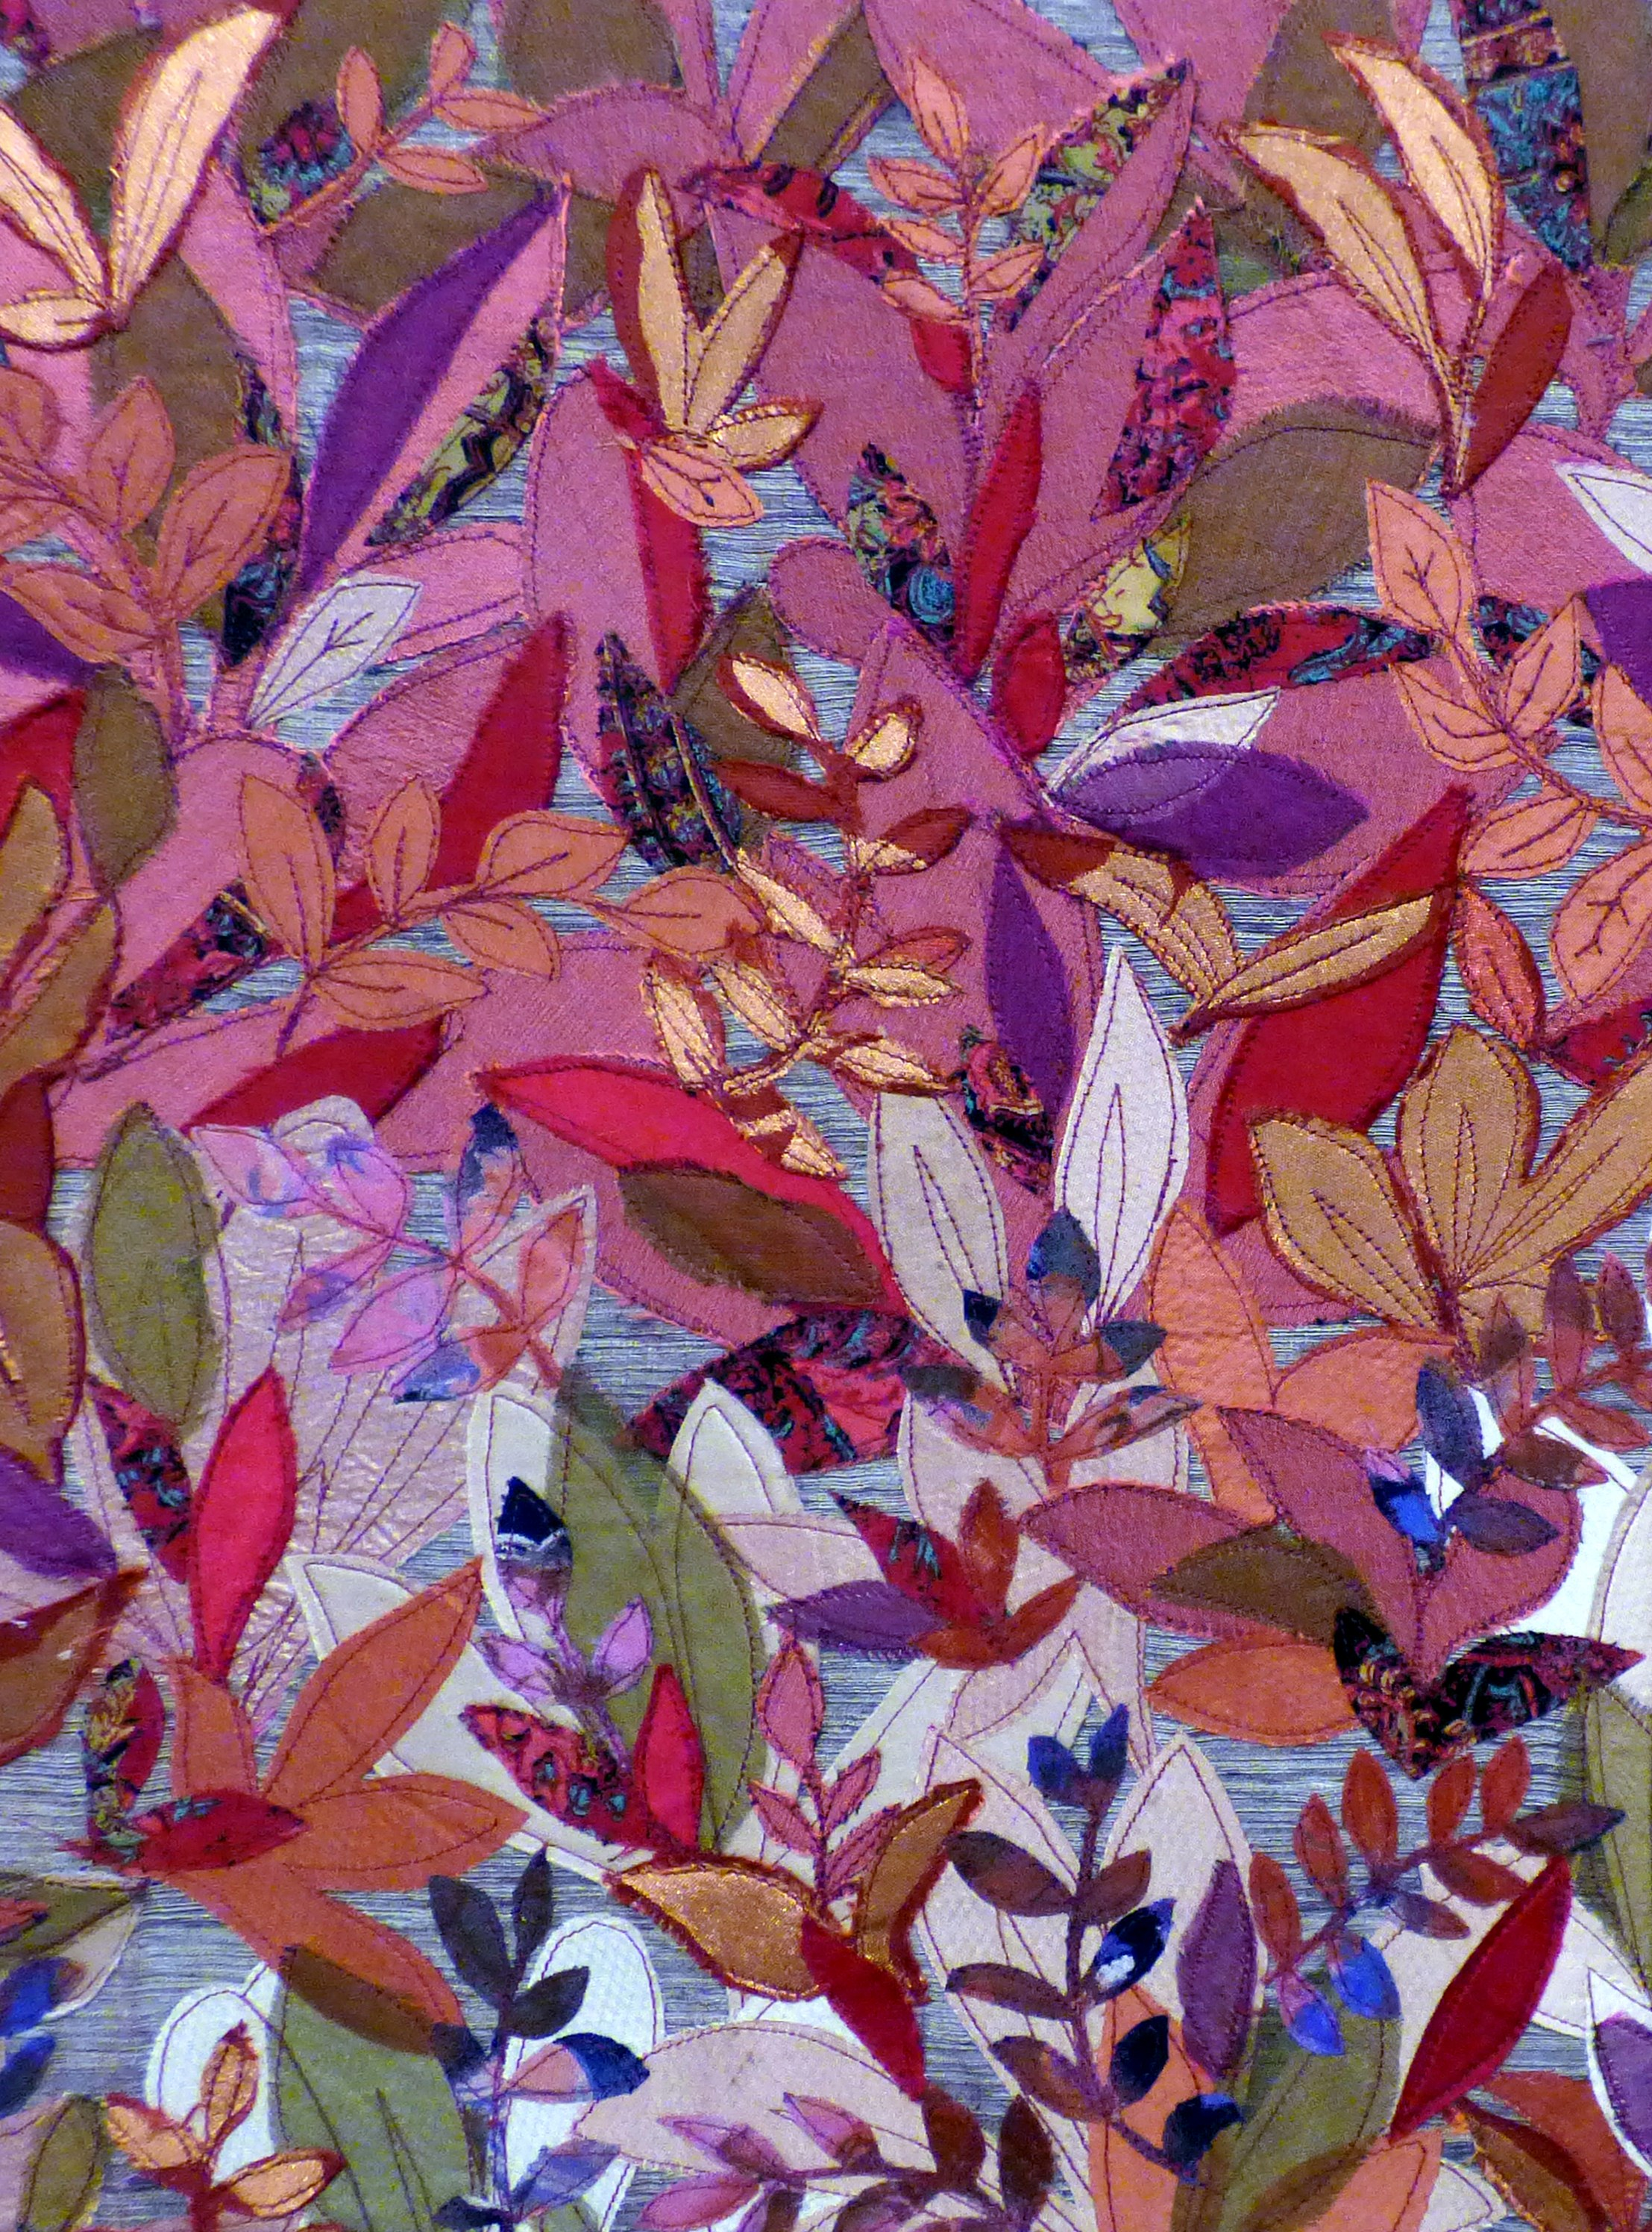 AUTUMN GLORY by Lesley Crowe-Bull, Ten Plus exhibition, Nantwich